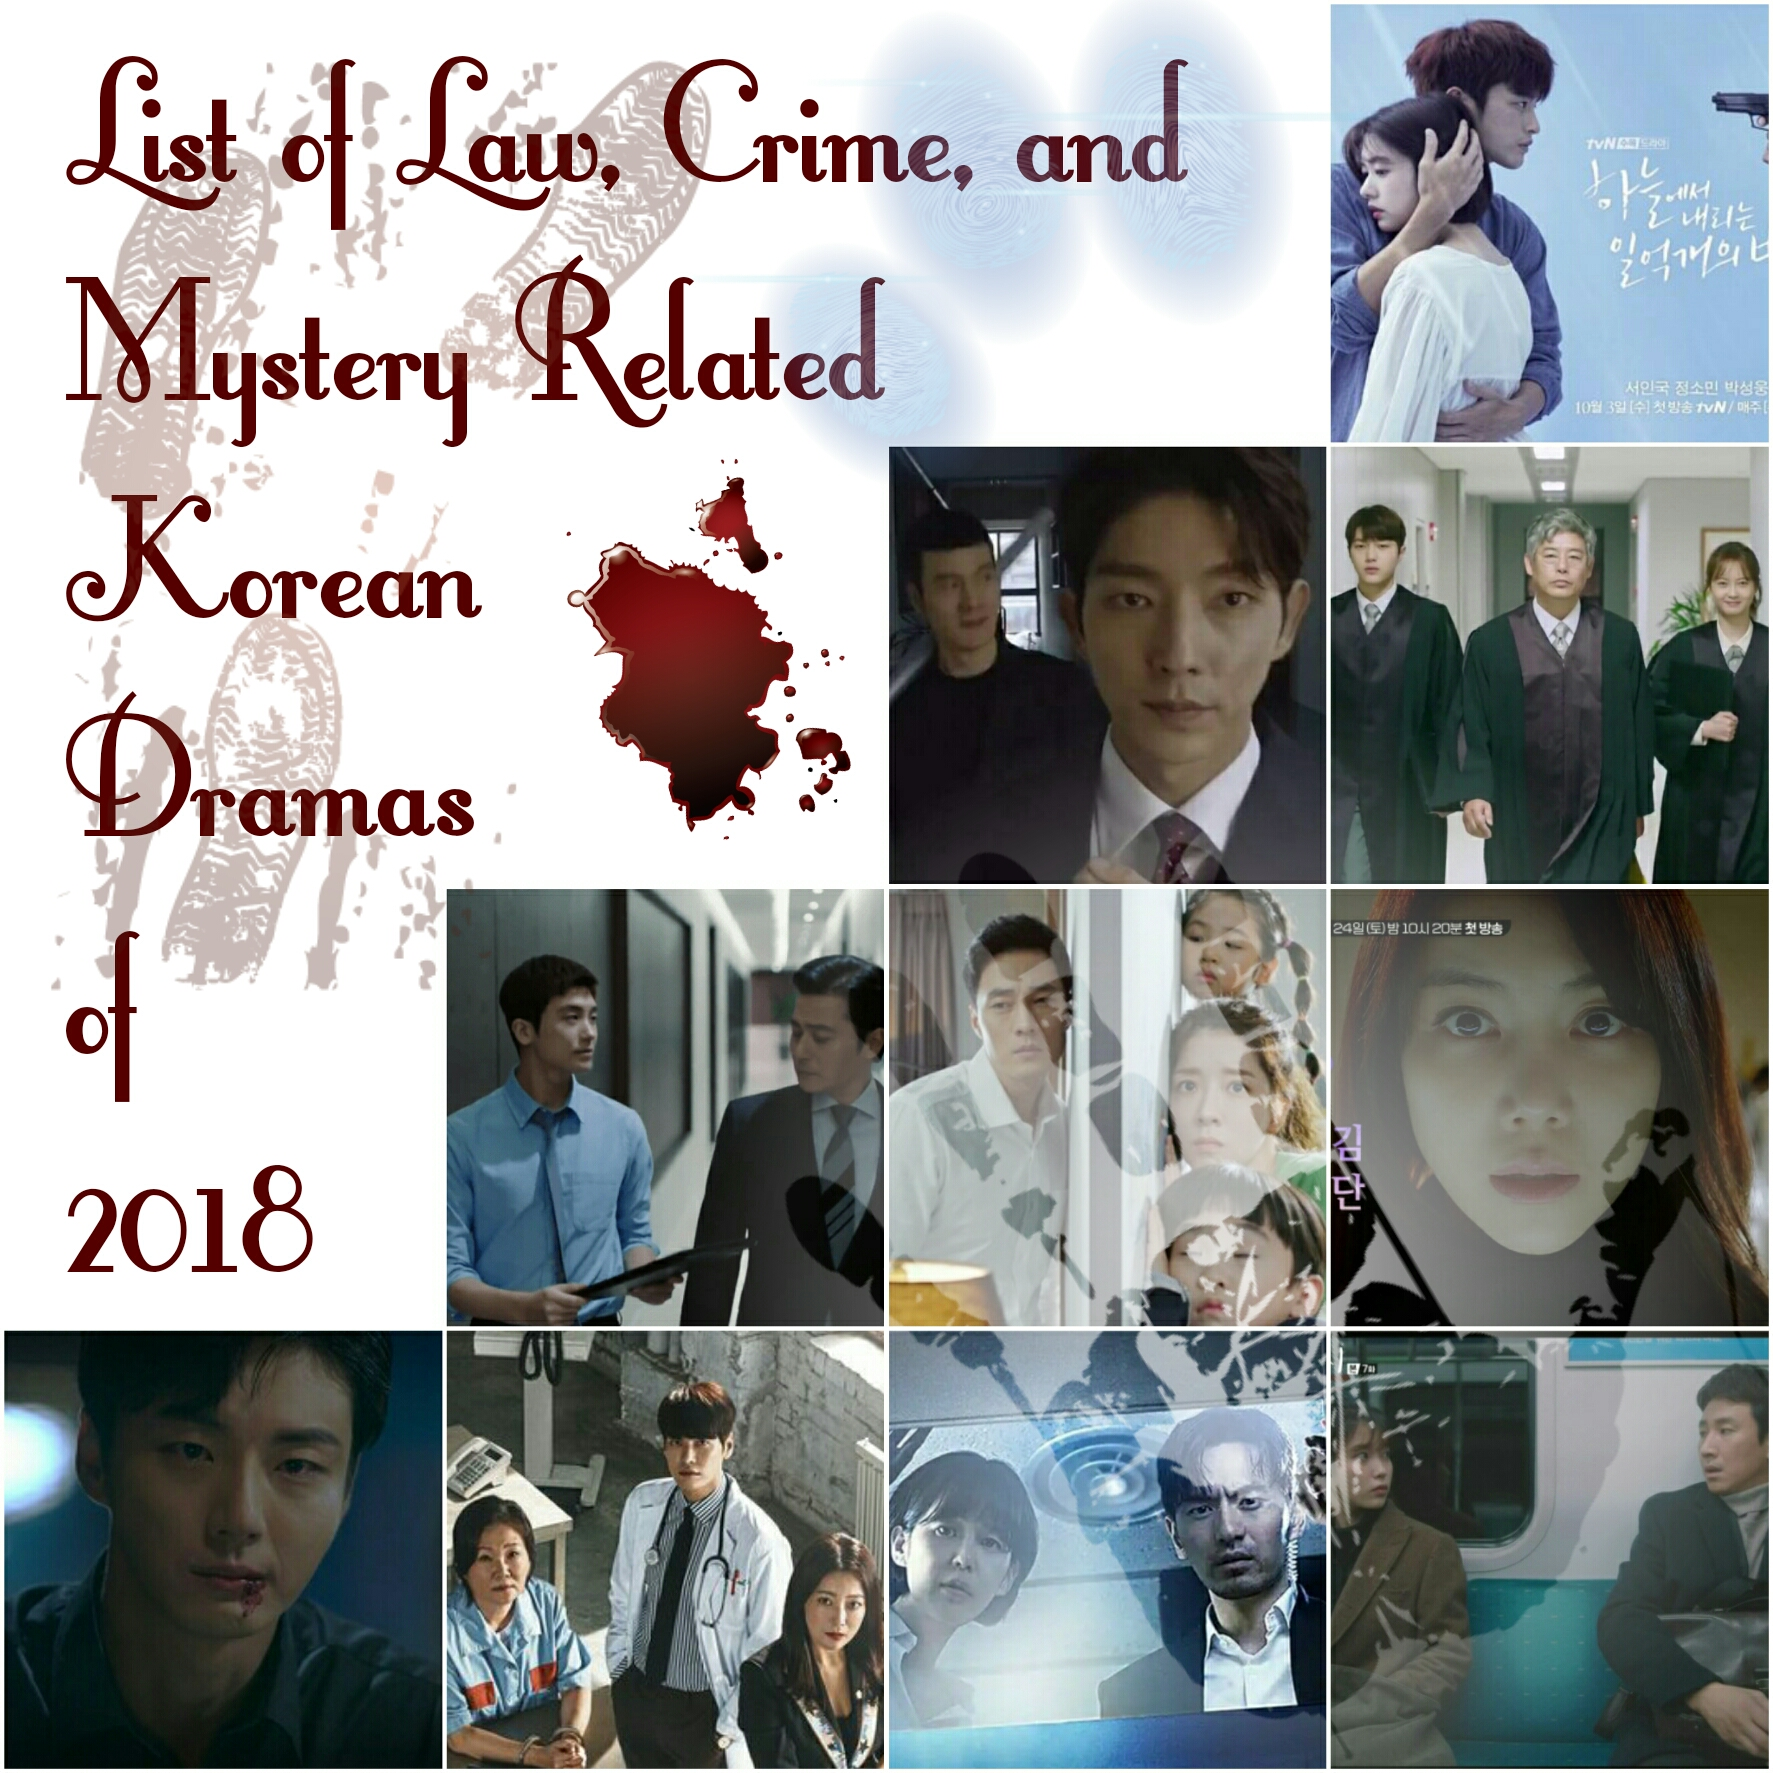 Top Romantic Comedy Kdrama 2018 Top 15 Romantic Comedy Korean Dramas